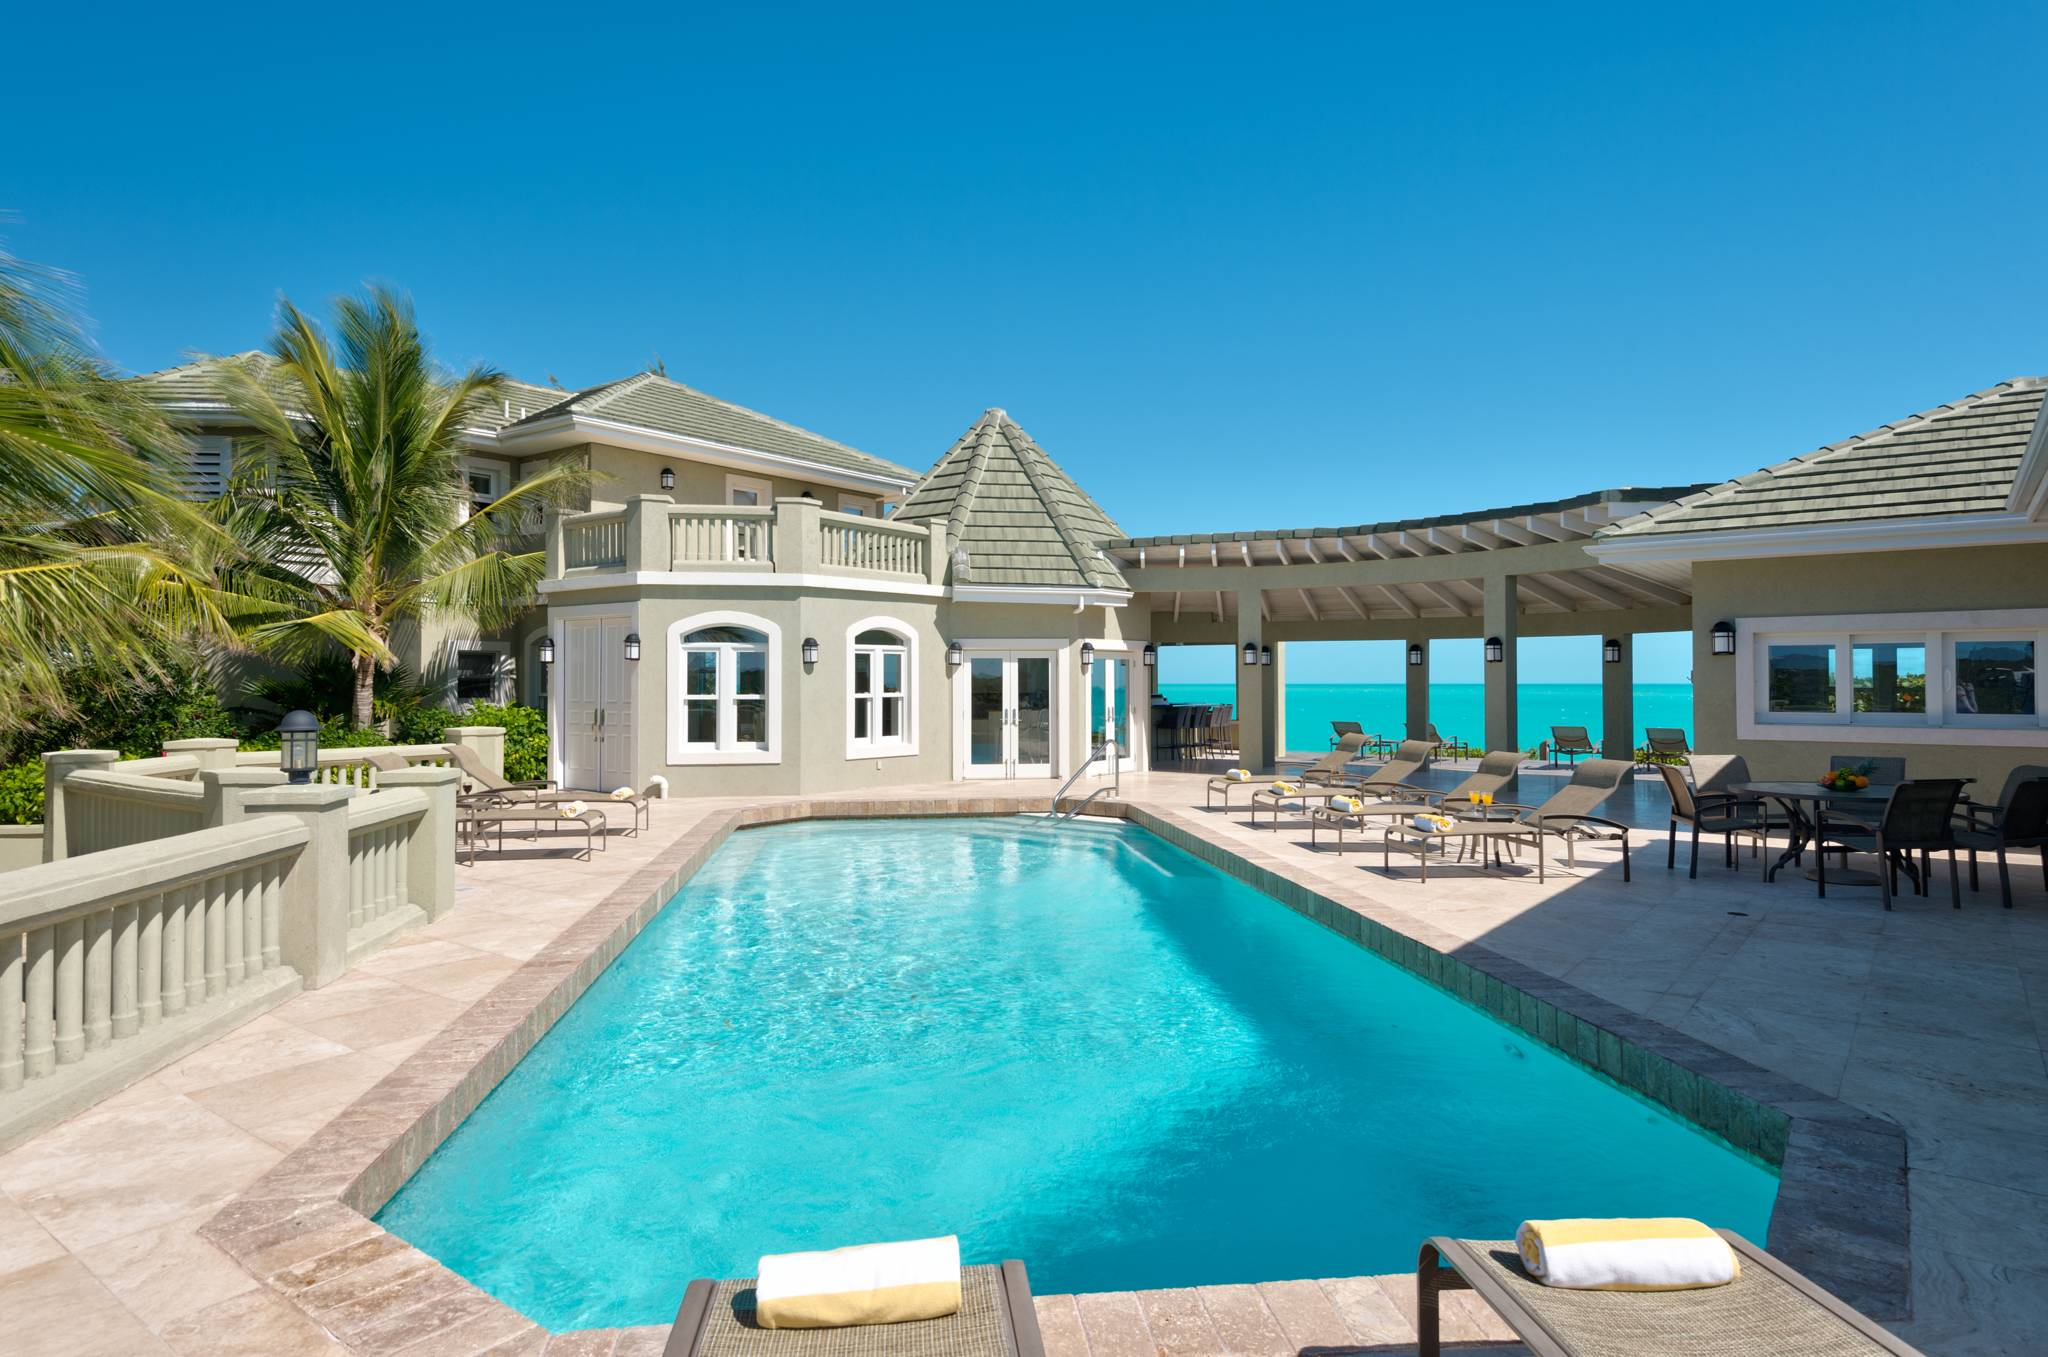 Casa Varnishkes a nine-bedroom beachfront villa on Long Bay Beach Providenciales